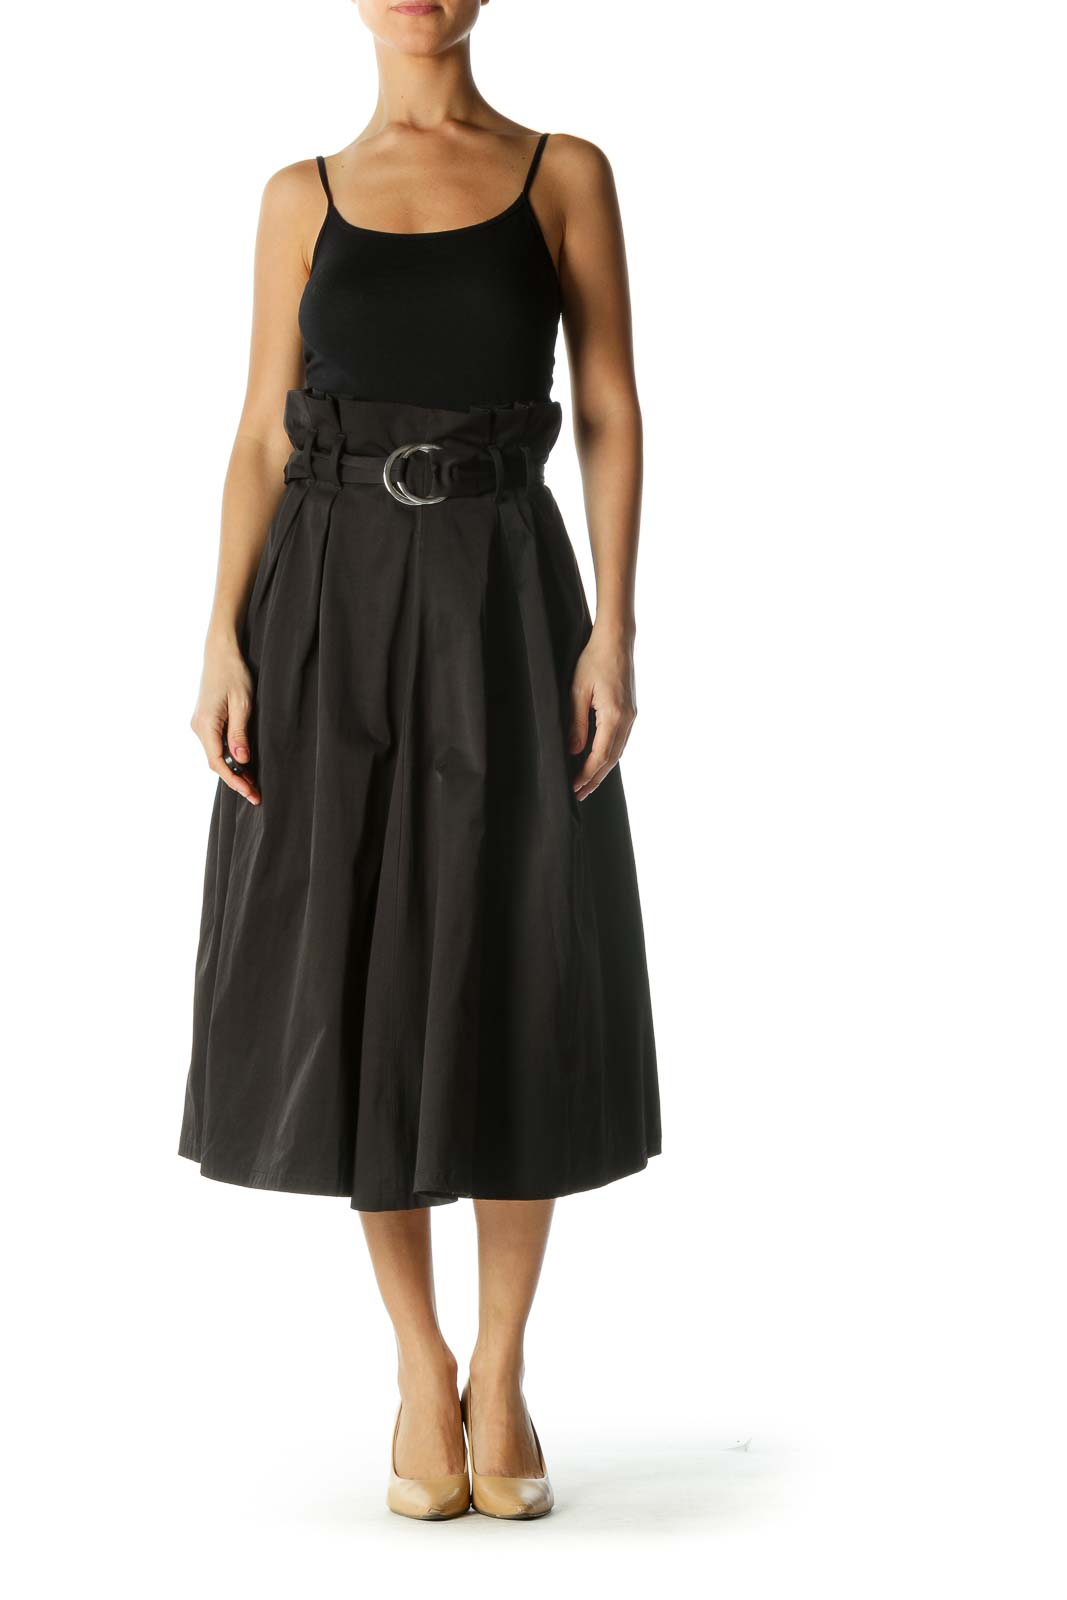 Black A-Line Skirt with Belt